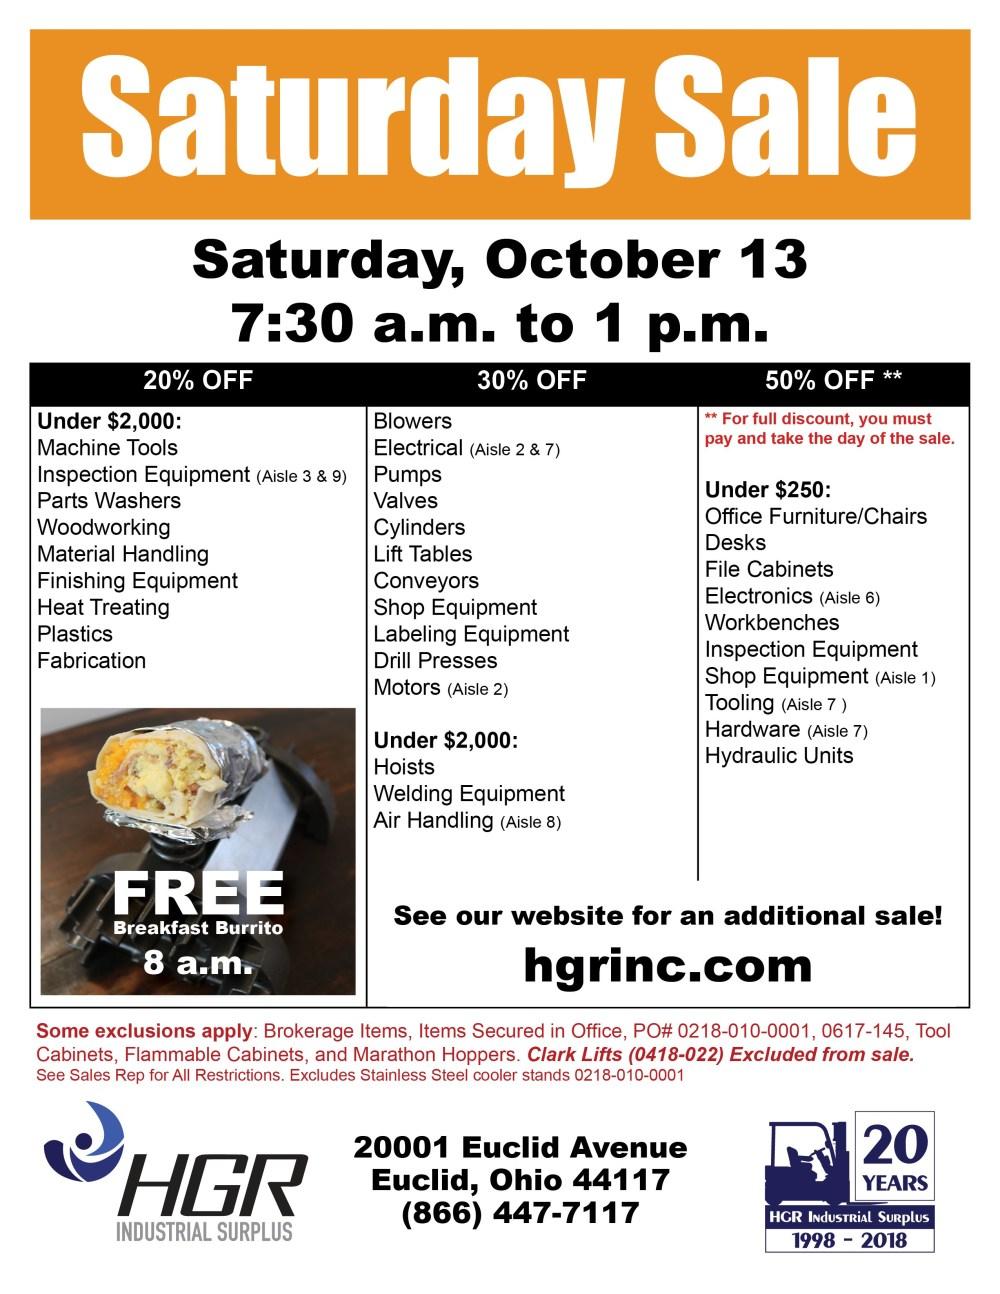 medium resolution of hgr industrial surplus october 2018 saturday sale flyer